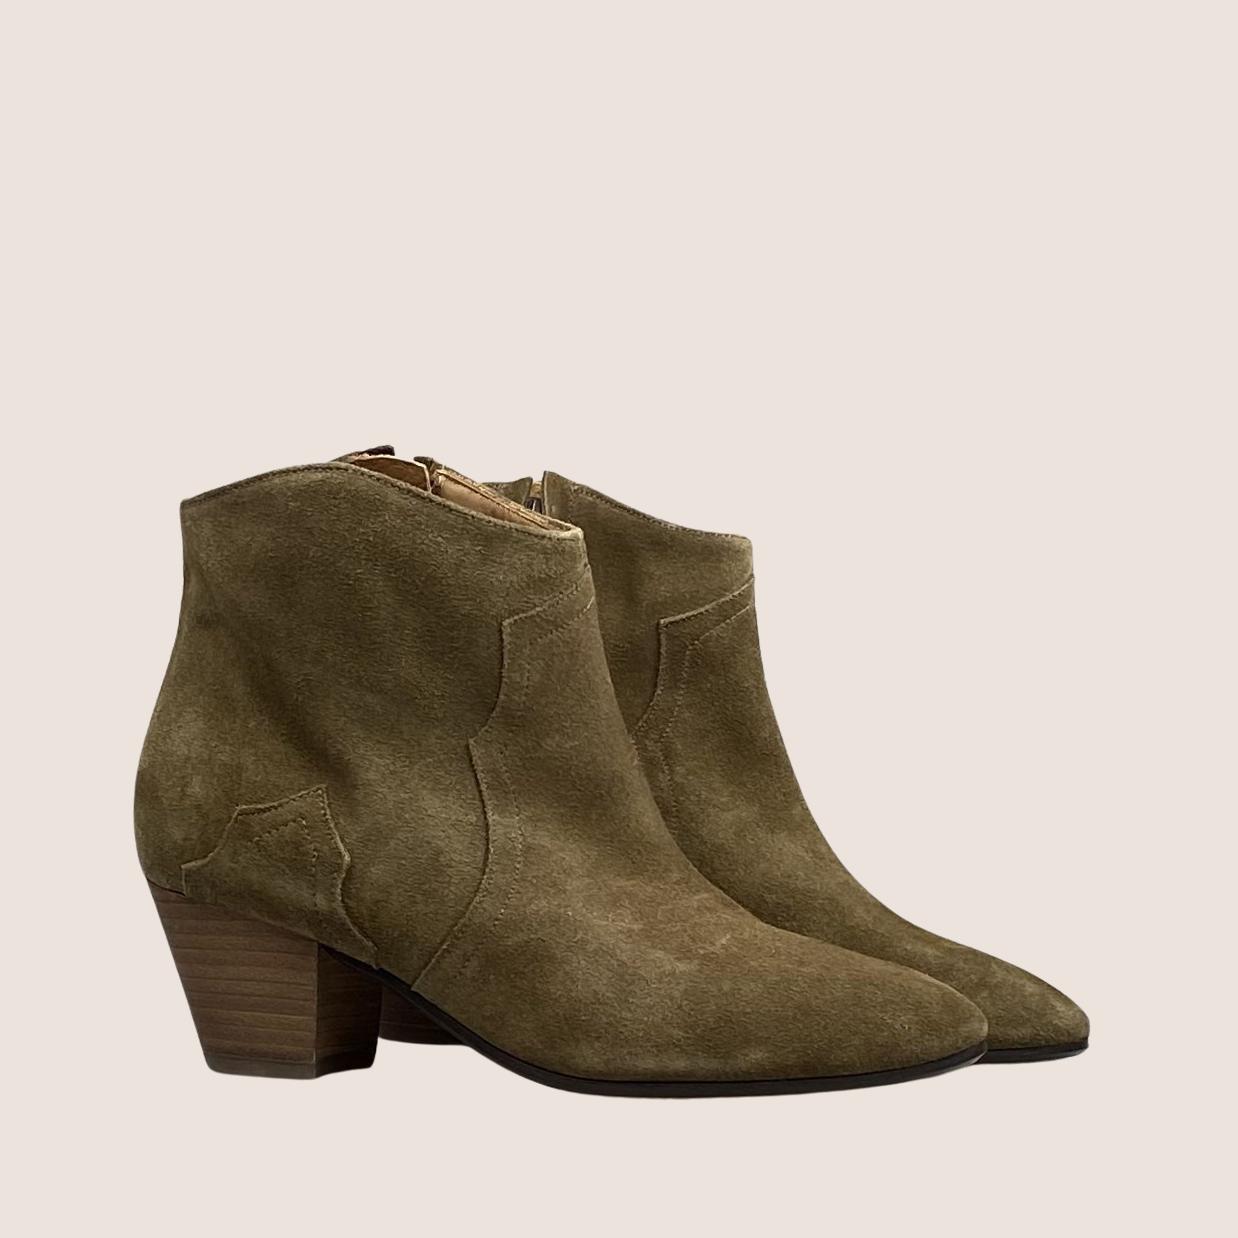 Dicker Boots - Suede